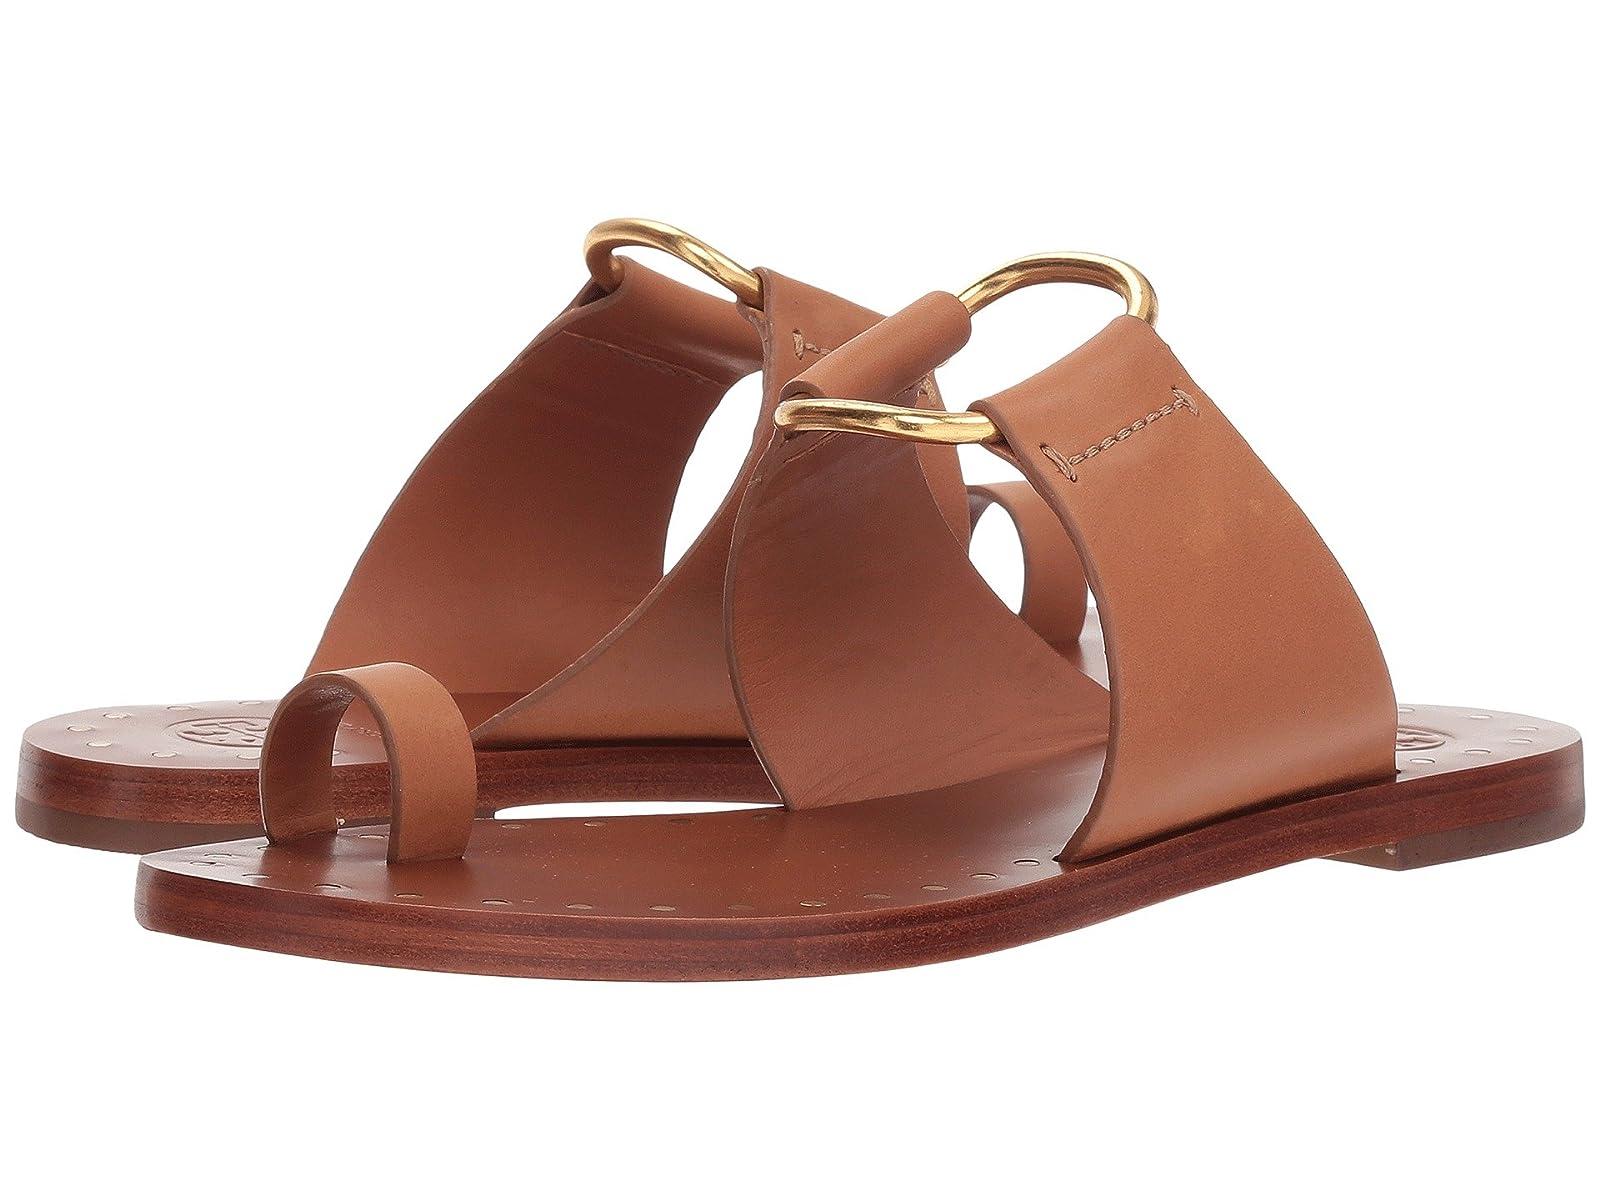 Tory Burch Brannan Studded SandalCheap and distinctive eye-catching shoes